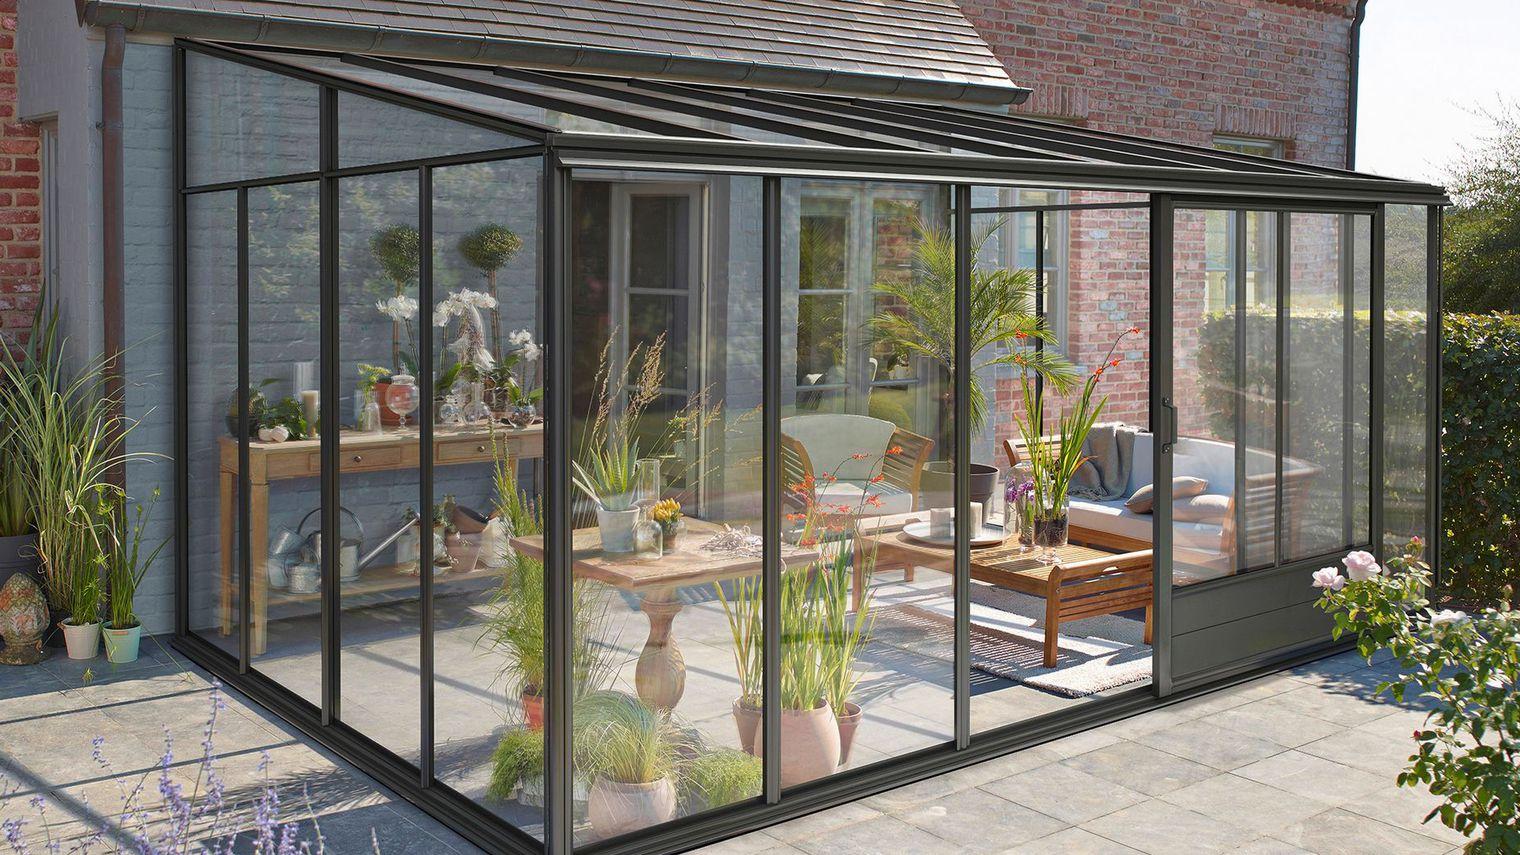 jardin-d-hiver-veranda-en-kit-castorama_5442289